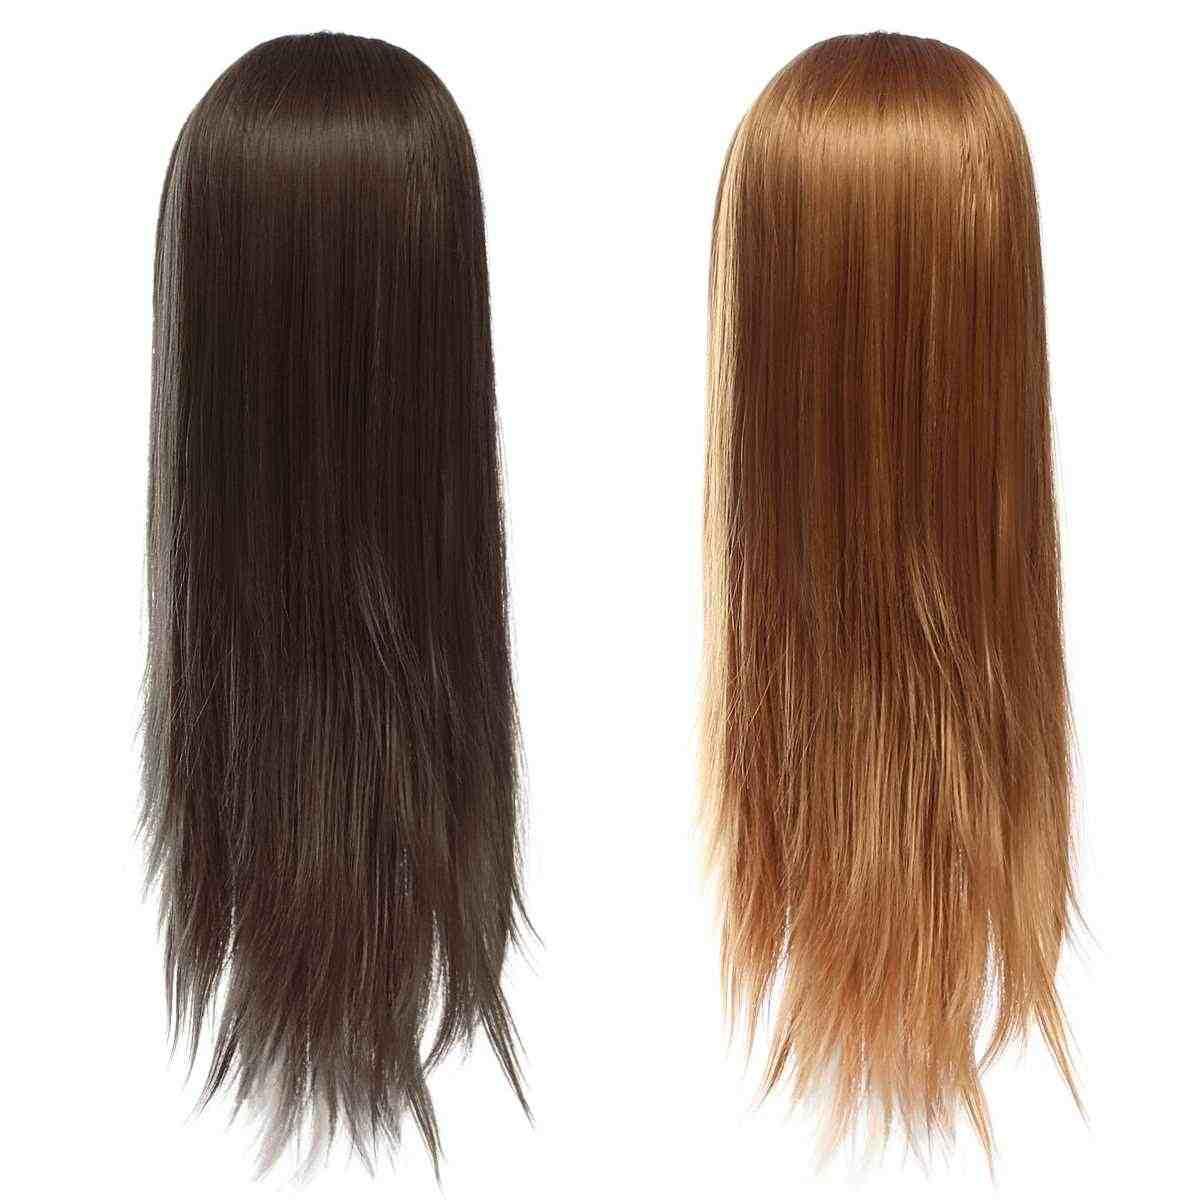 70cm Hair Kappers Training Mannequins Pruik Hoofd Professionele Salon Practice Head Kapper Hair Styling + Beugel